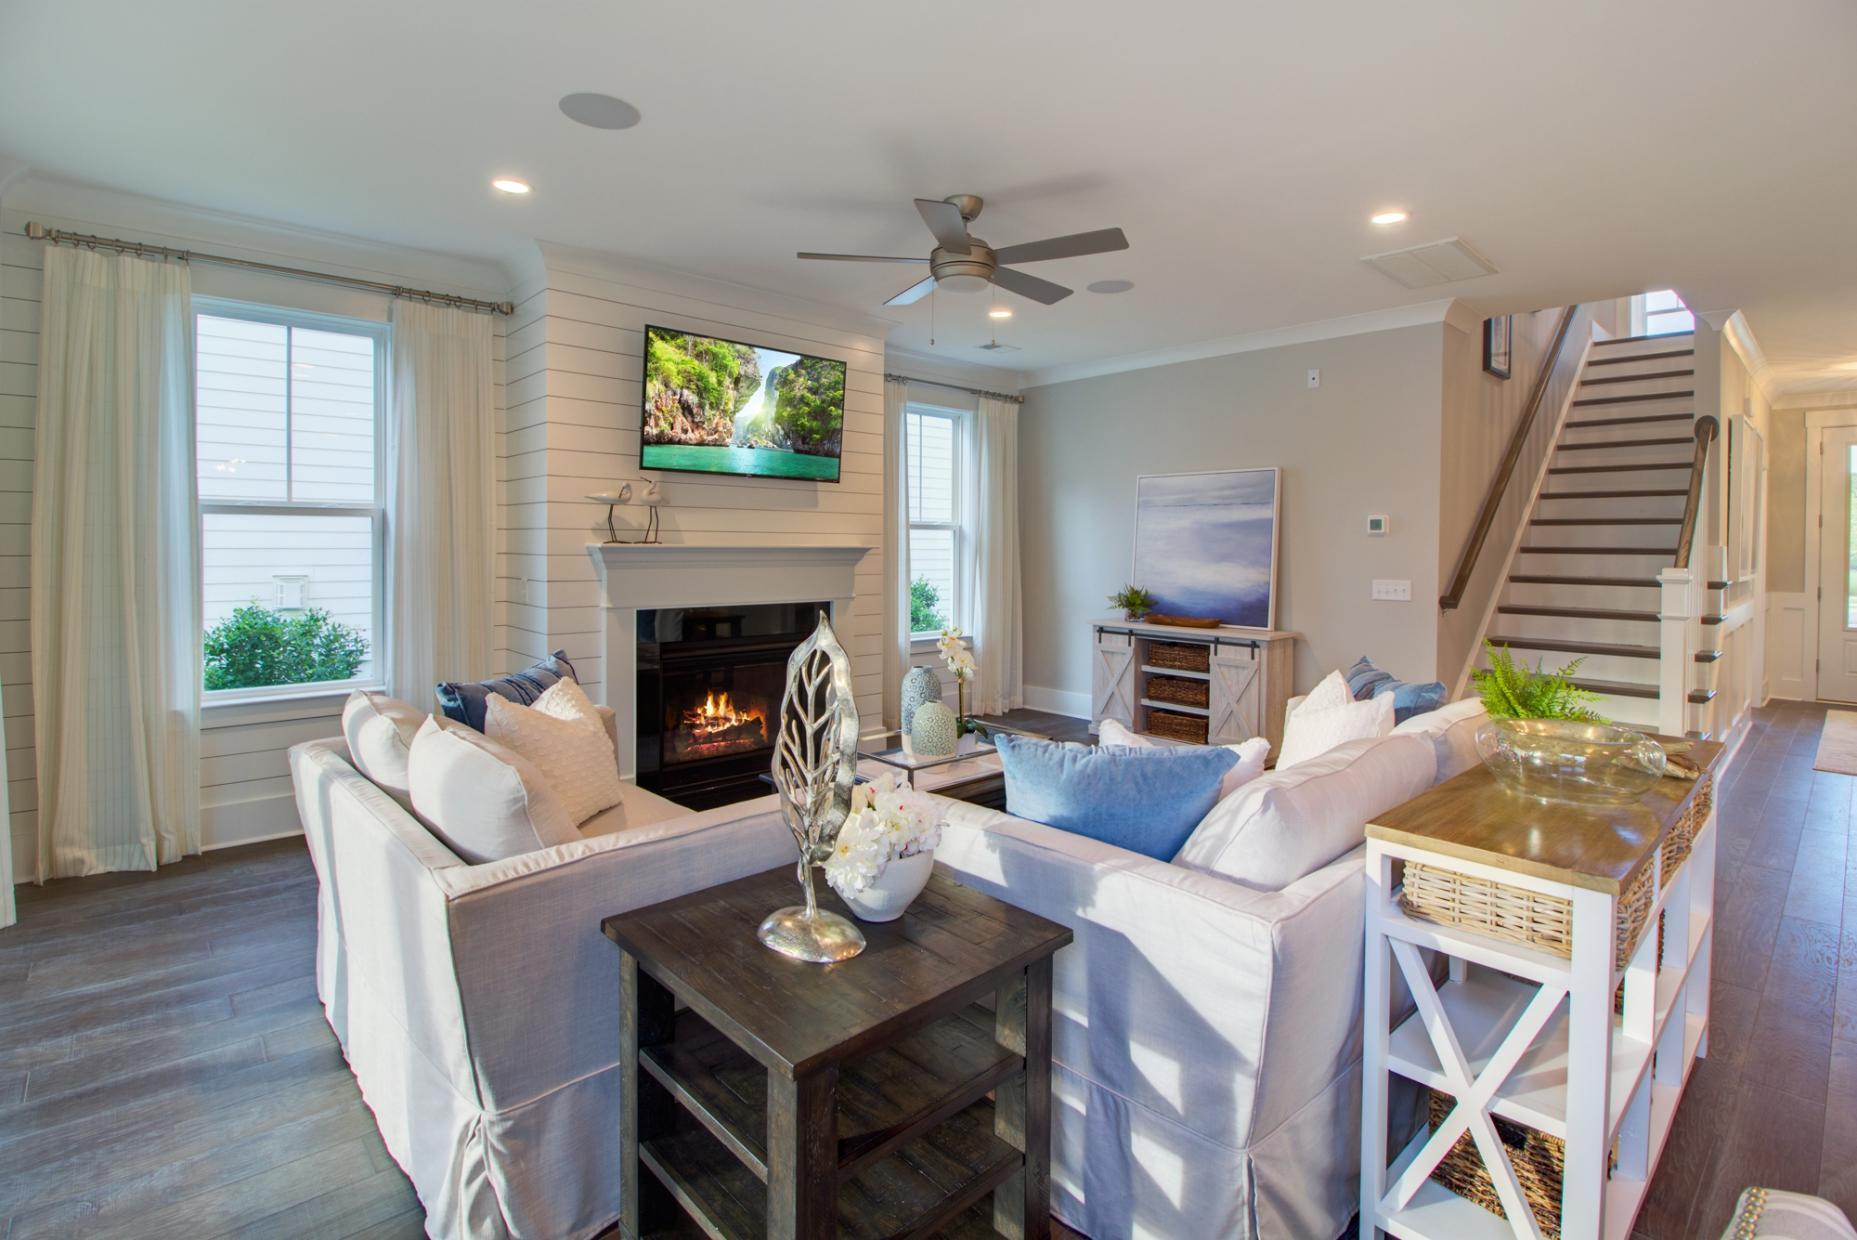 Carnes Crossroads Homes For Sale - 501 Wodin, Summerville, SC - 10